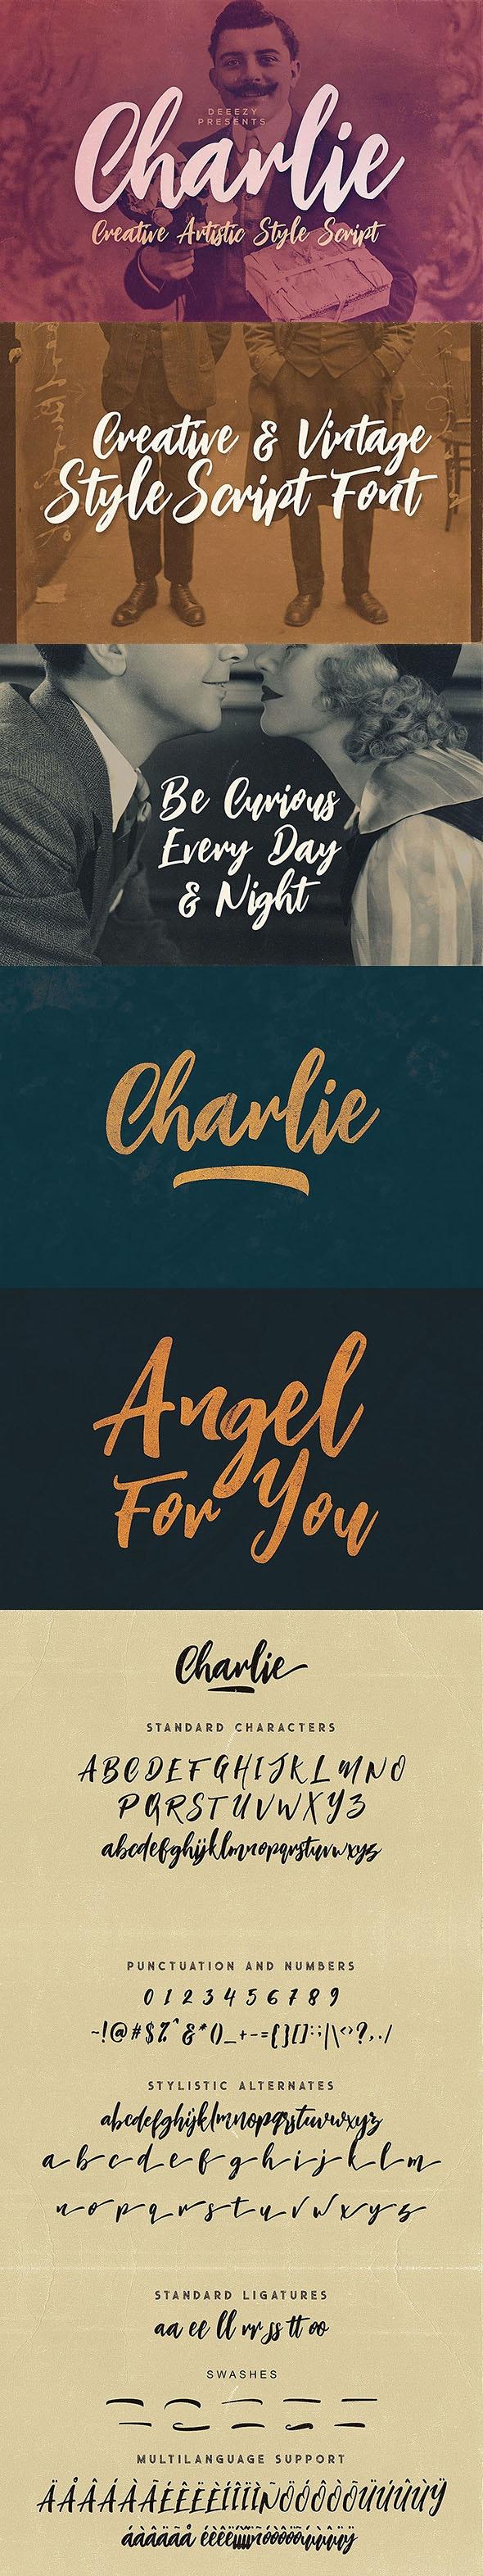 Charlie Script Font - Hand-writing Script